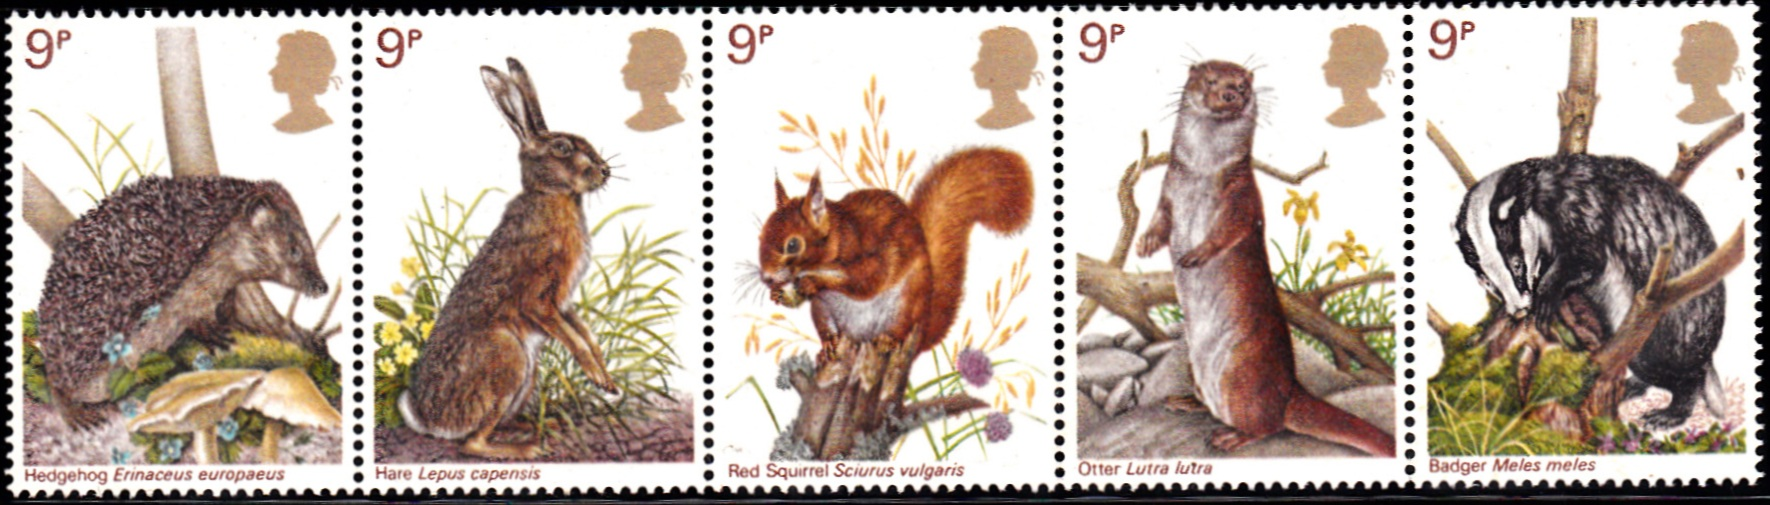 816-820 Wildlife Protection [England Setenant Stamp 1977]